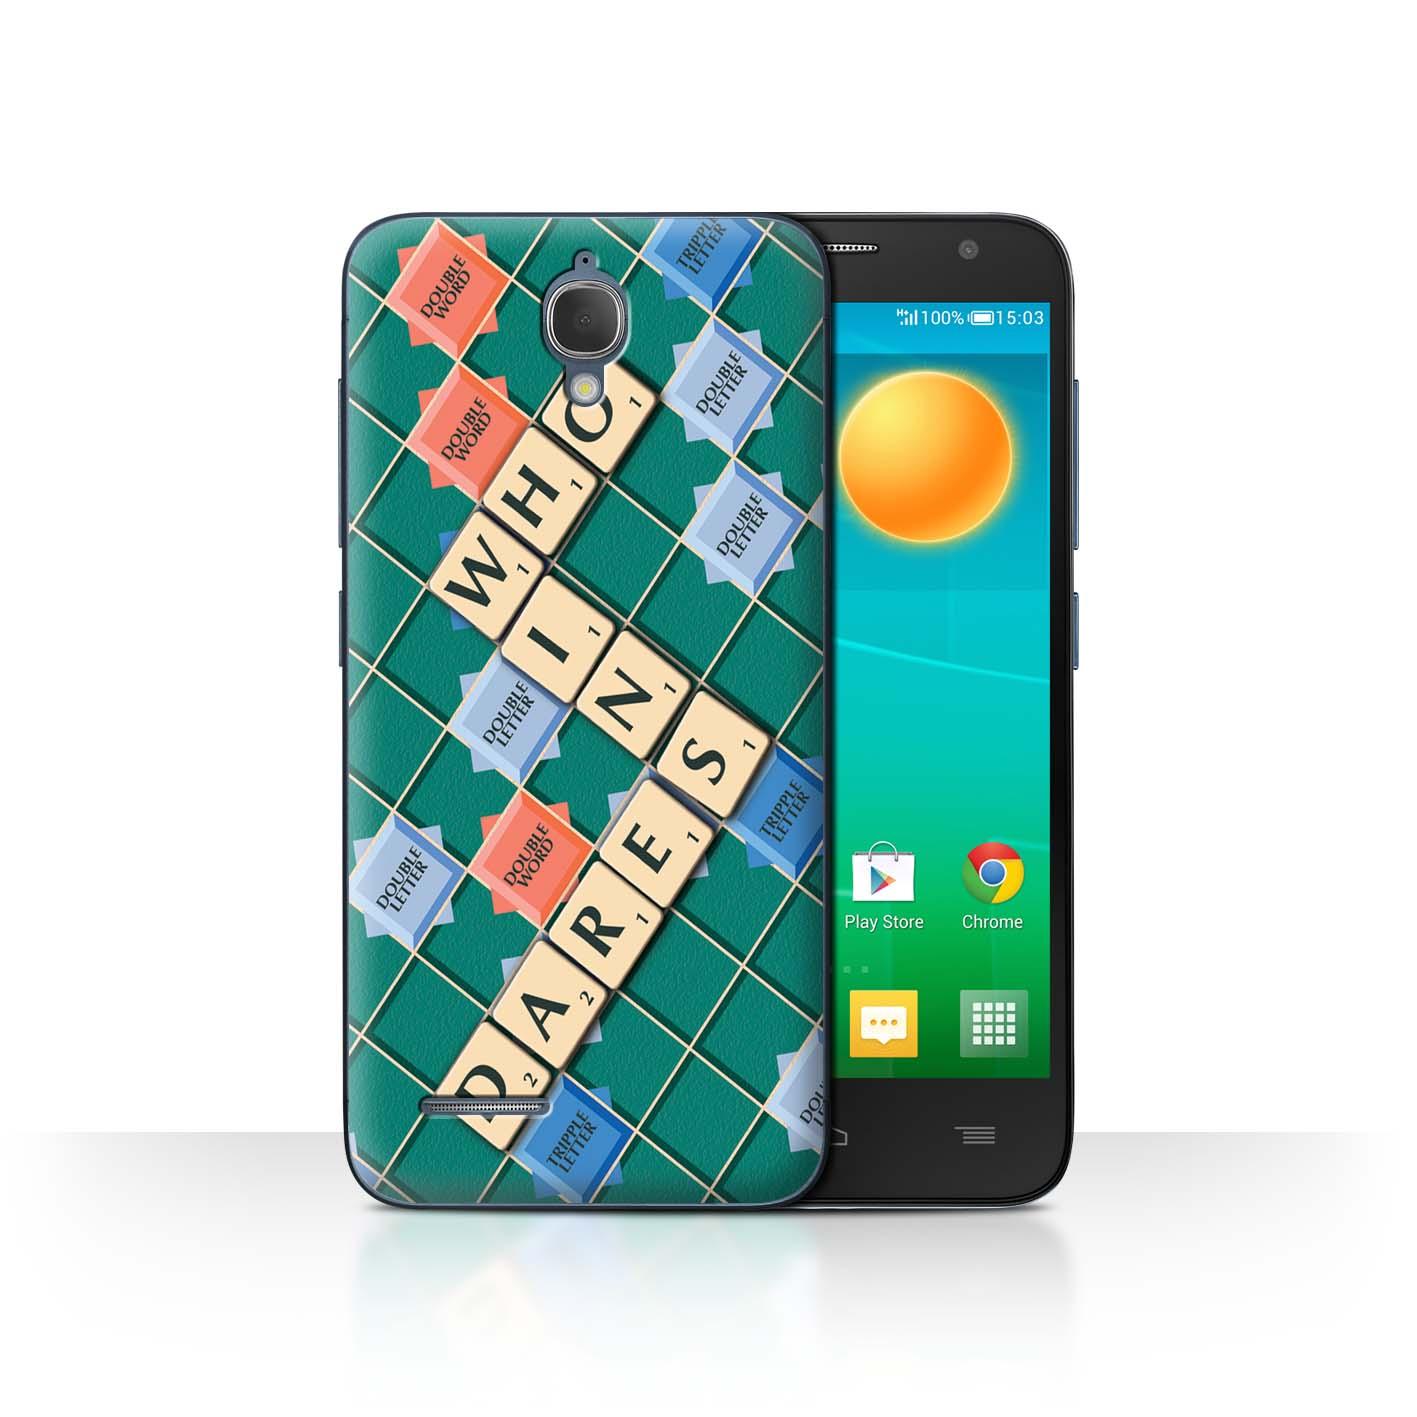 STUFF4-Back-Case-Cover-Skin-for-Alcatel-Idol-2-Mini-Scrabble-Words